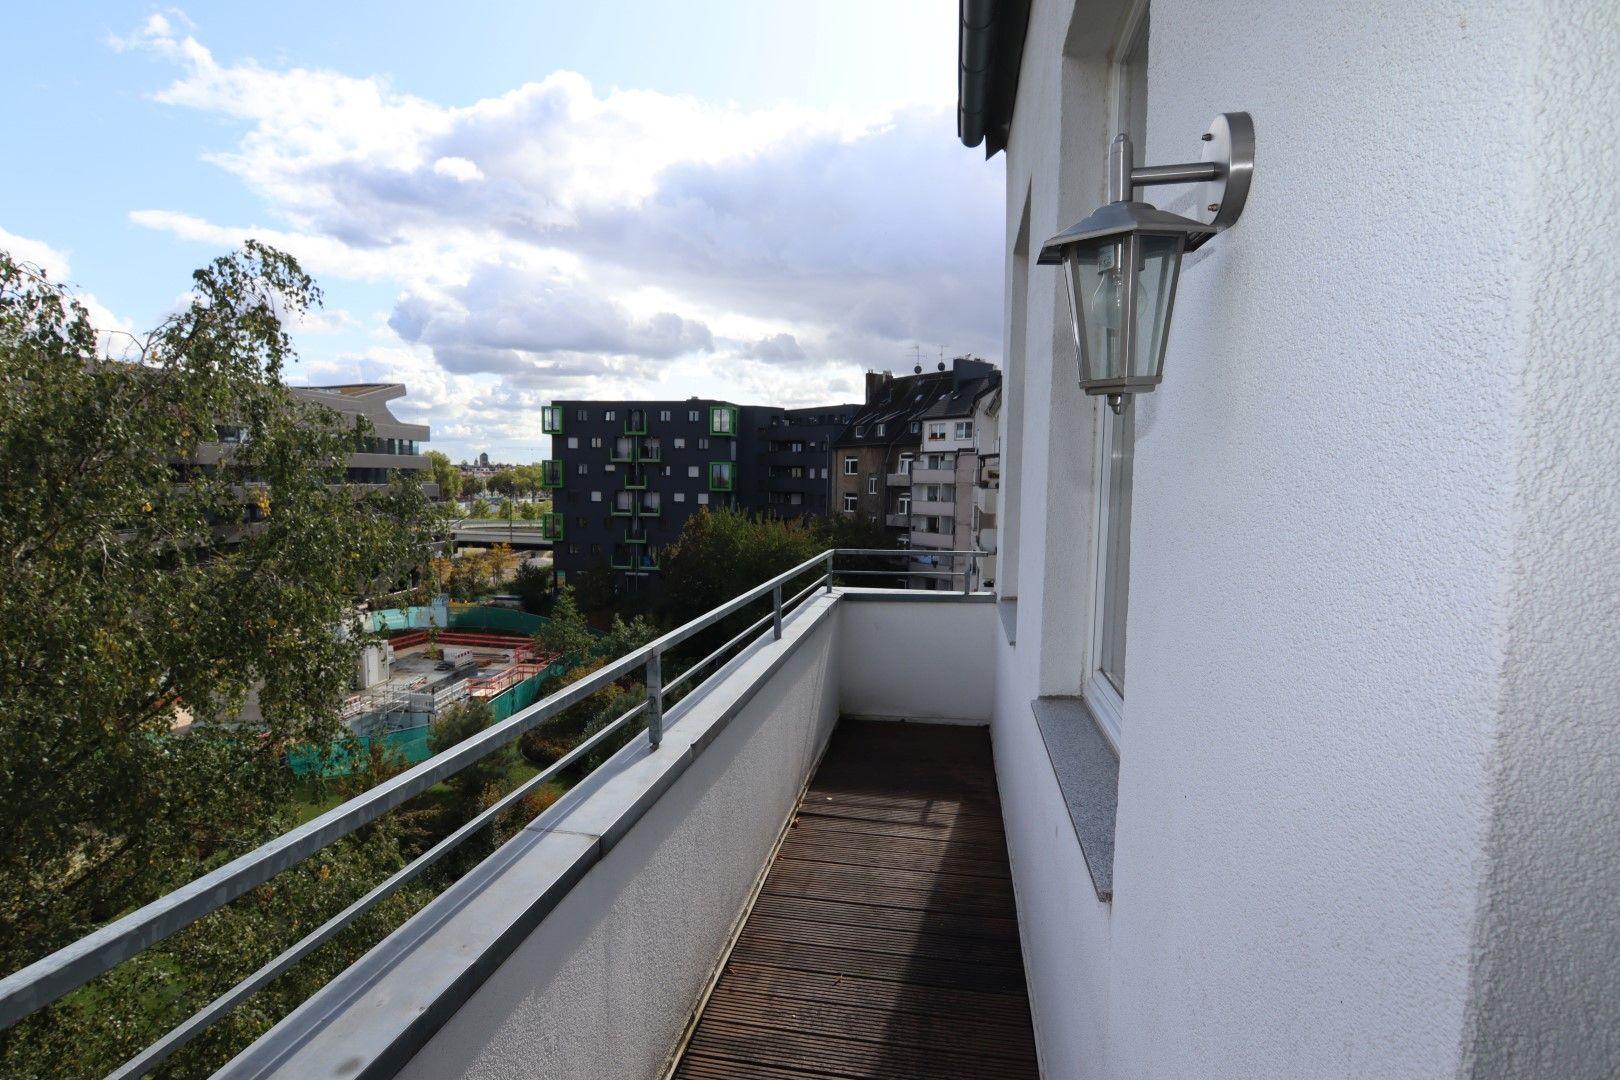 Immobilie Nr.0271 - 3-Zimmer-Altbauwohnung mit Aufzug im 3.OG - Bild 6.jpg